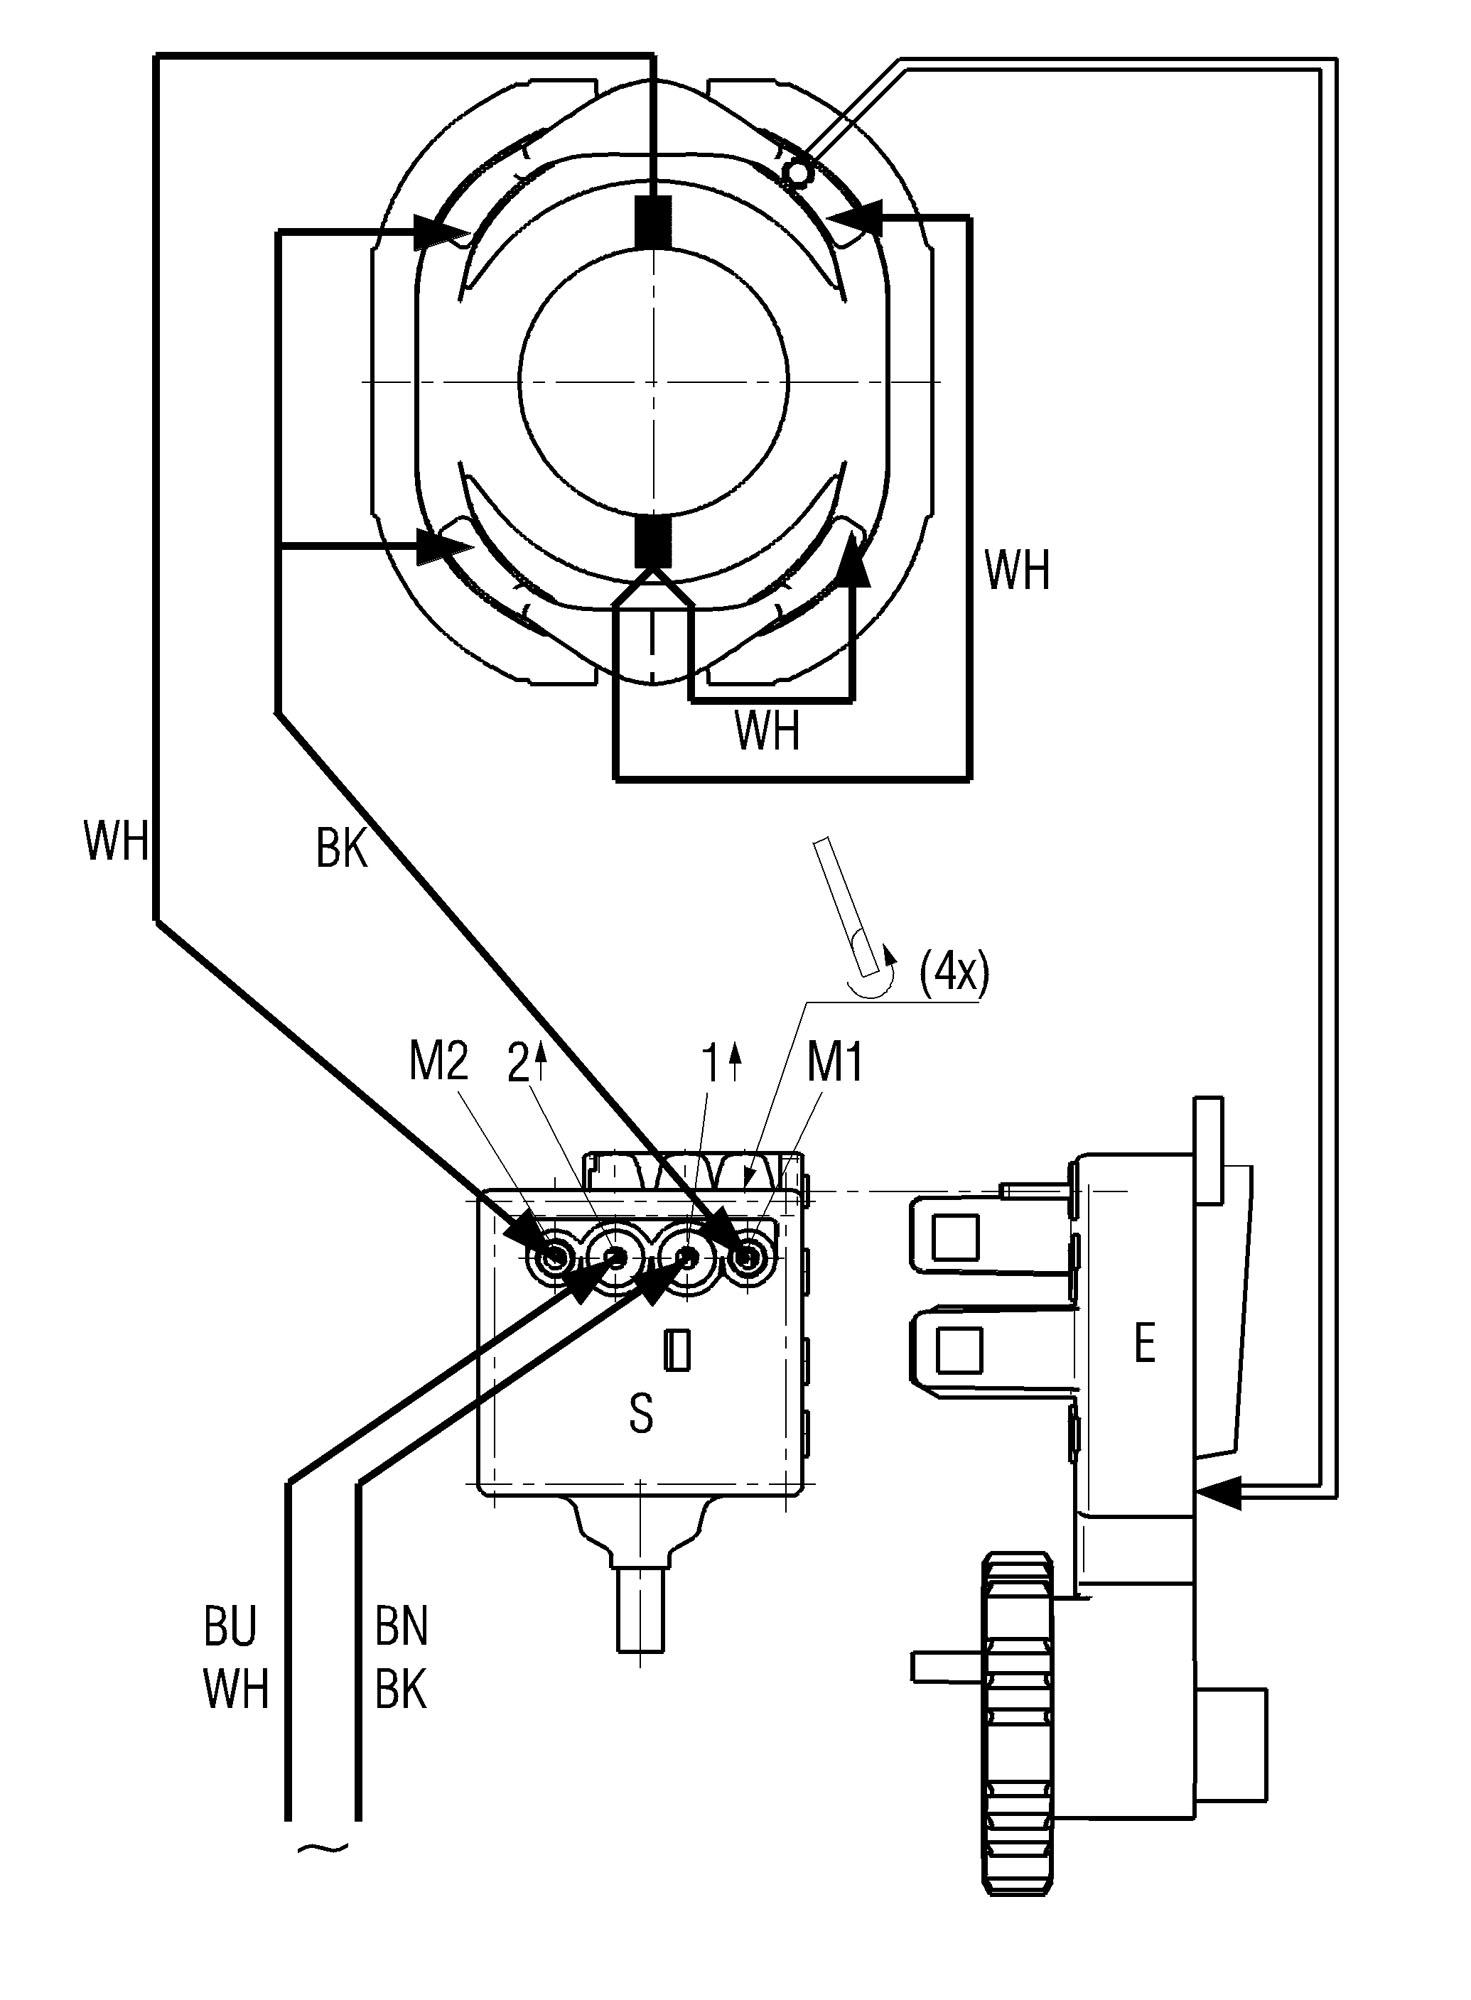 wiring diagram for grinder wiring diagram general helper plasma cutter wiring diagram craftsman hammer drill wiring diagram